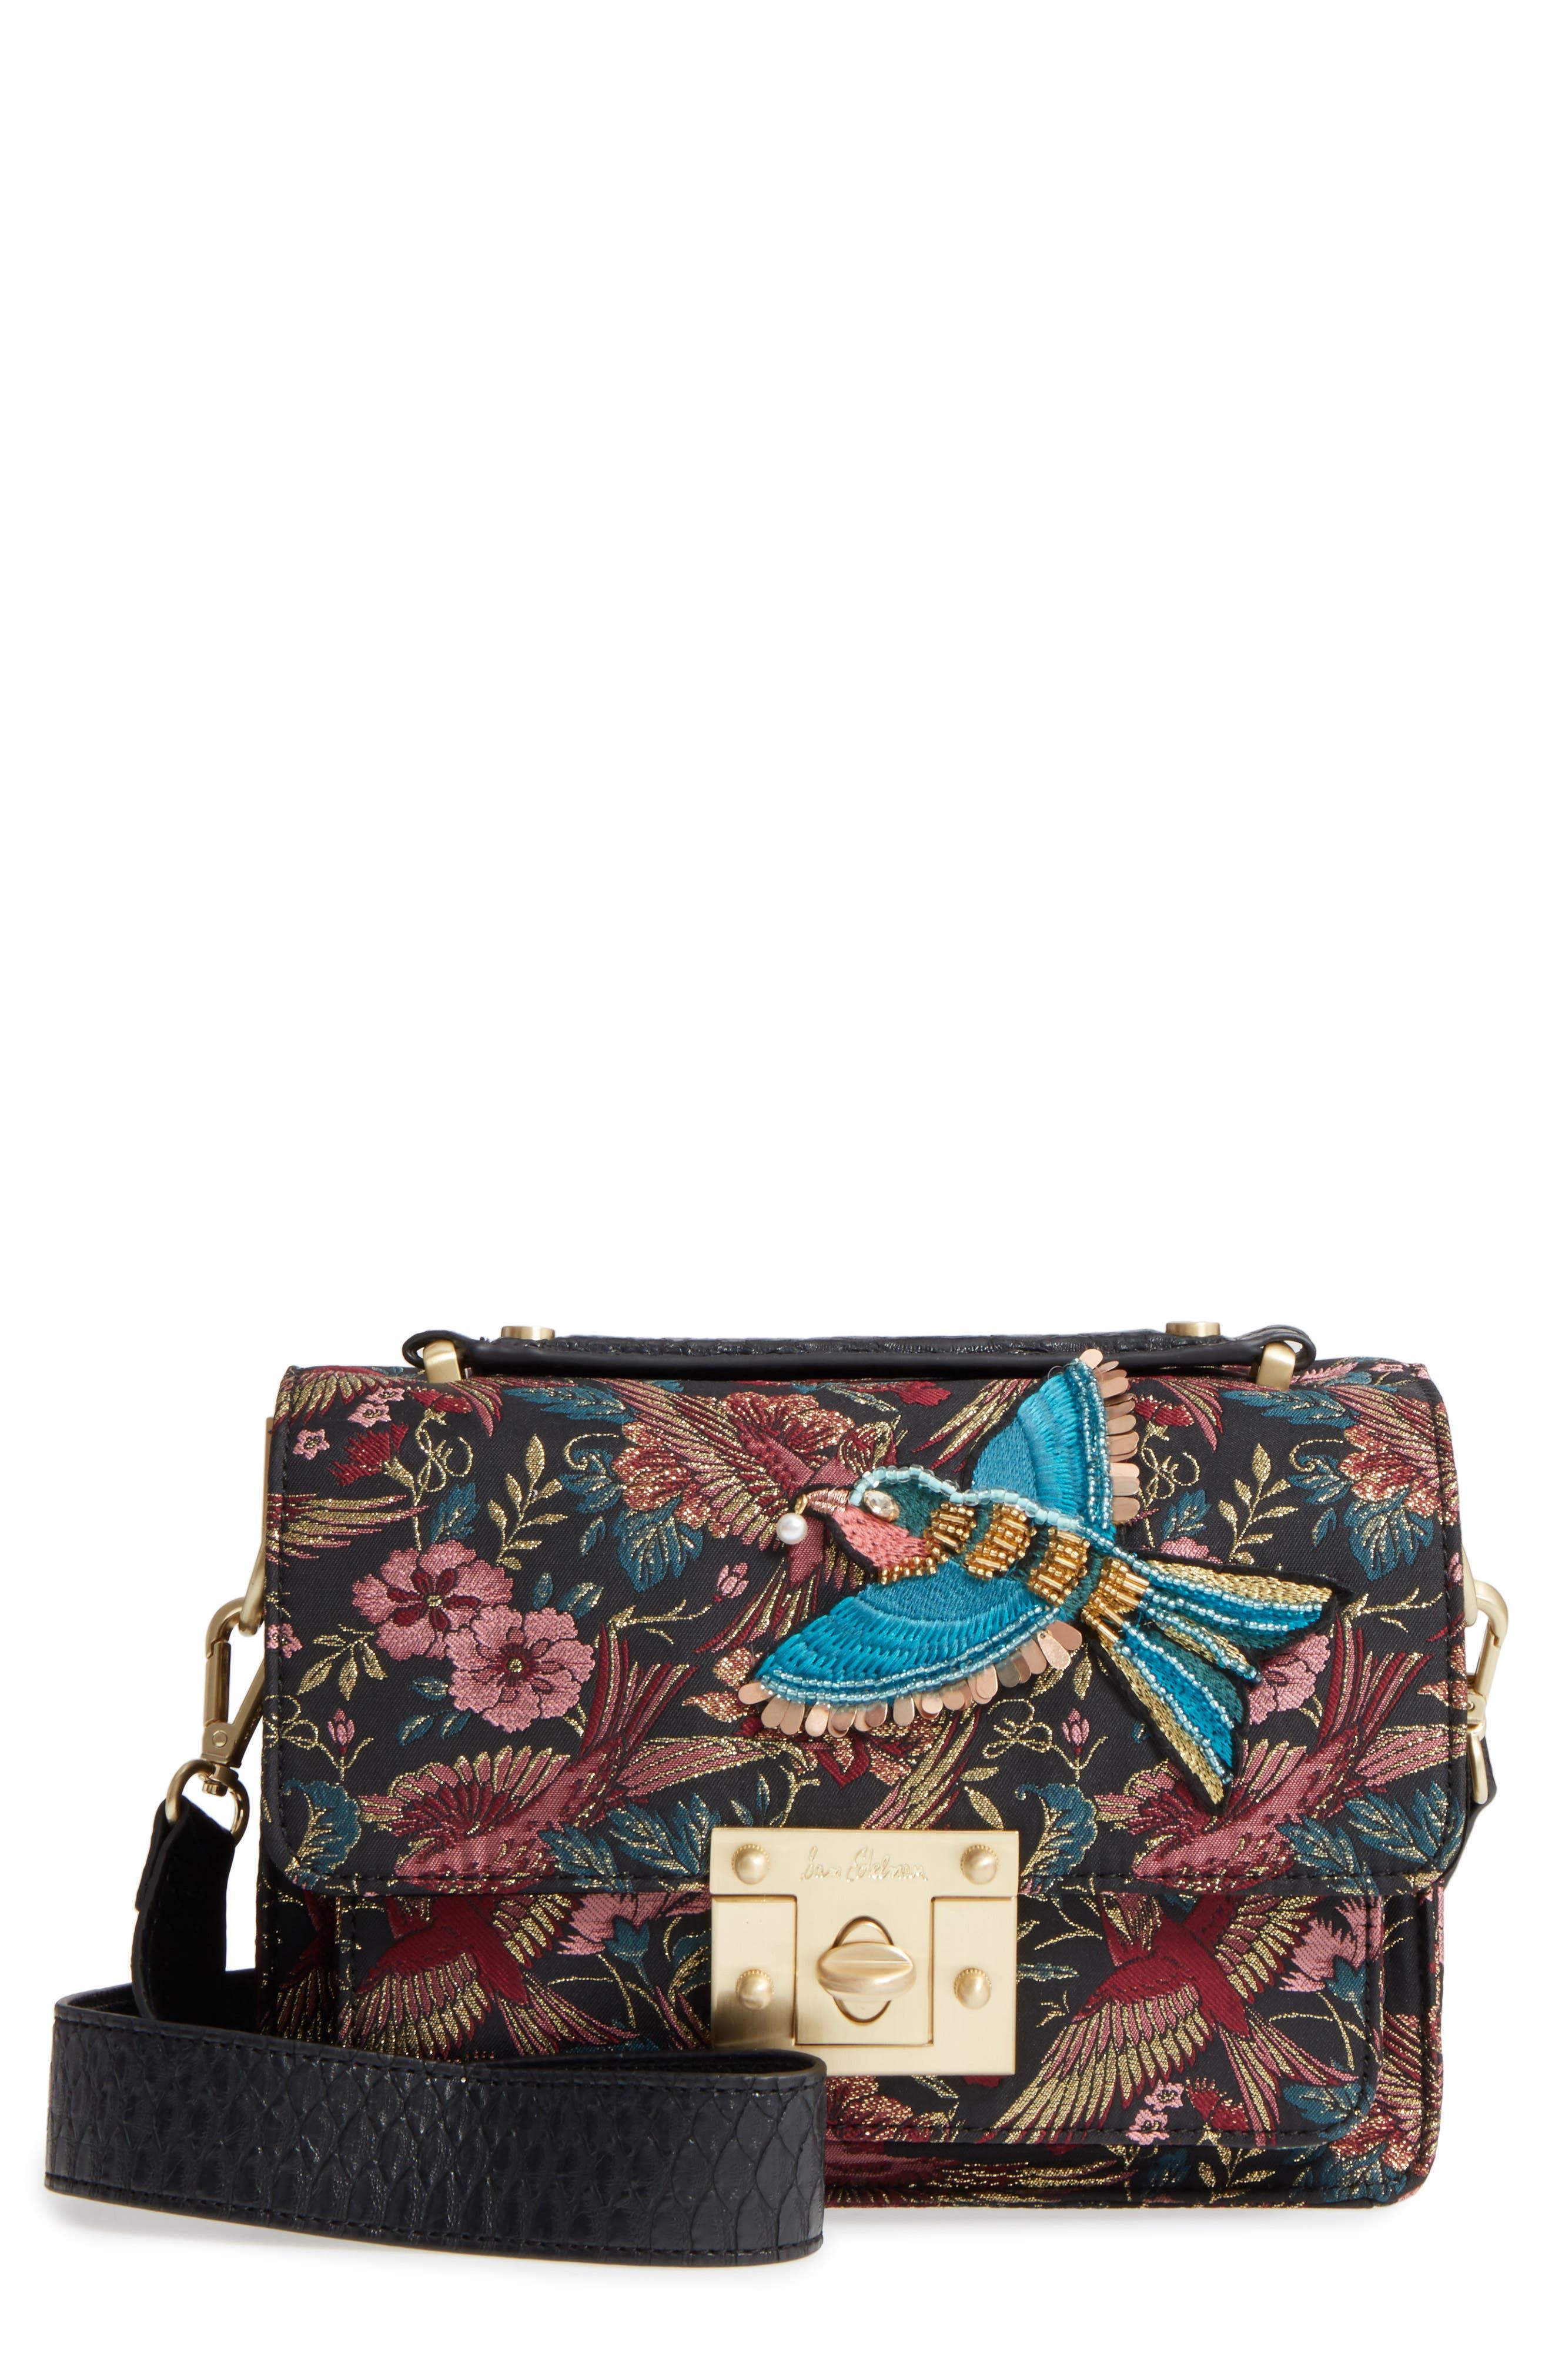 Sam Edelman Gessica Jacquard Shoulder Bag